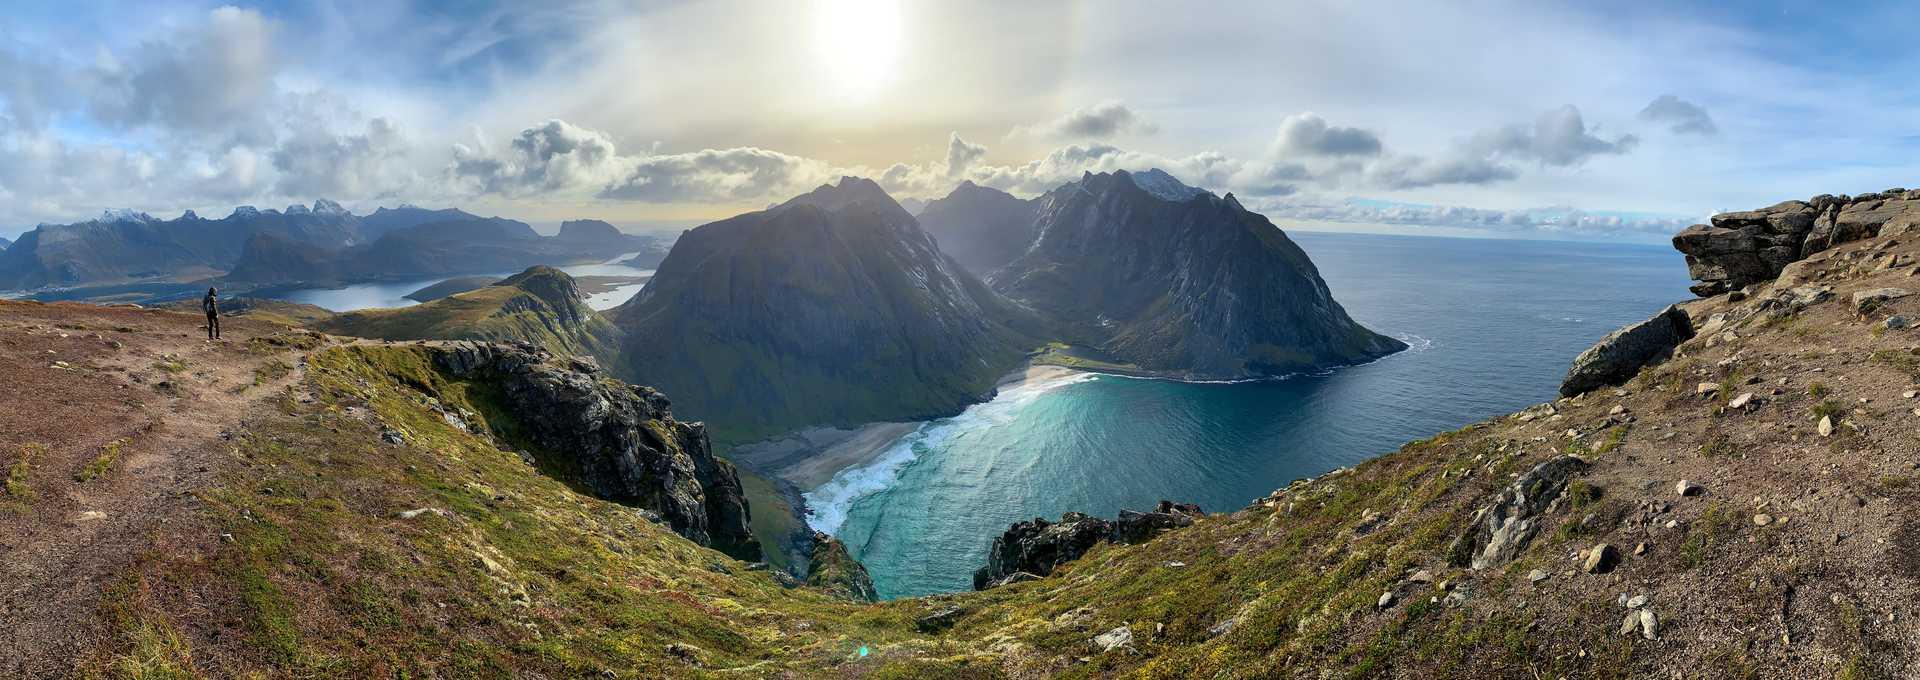 Randonnée jusqu'au mont Ryten, vue sur Kvalvika